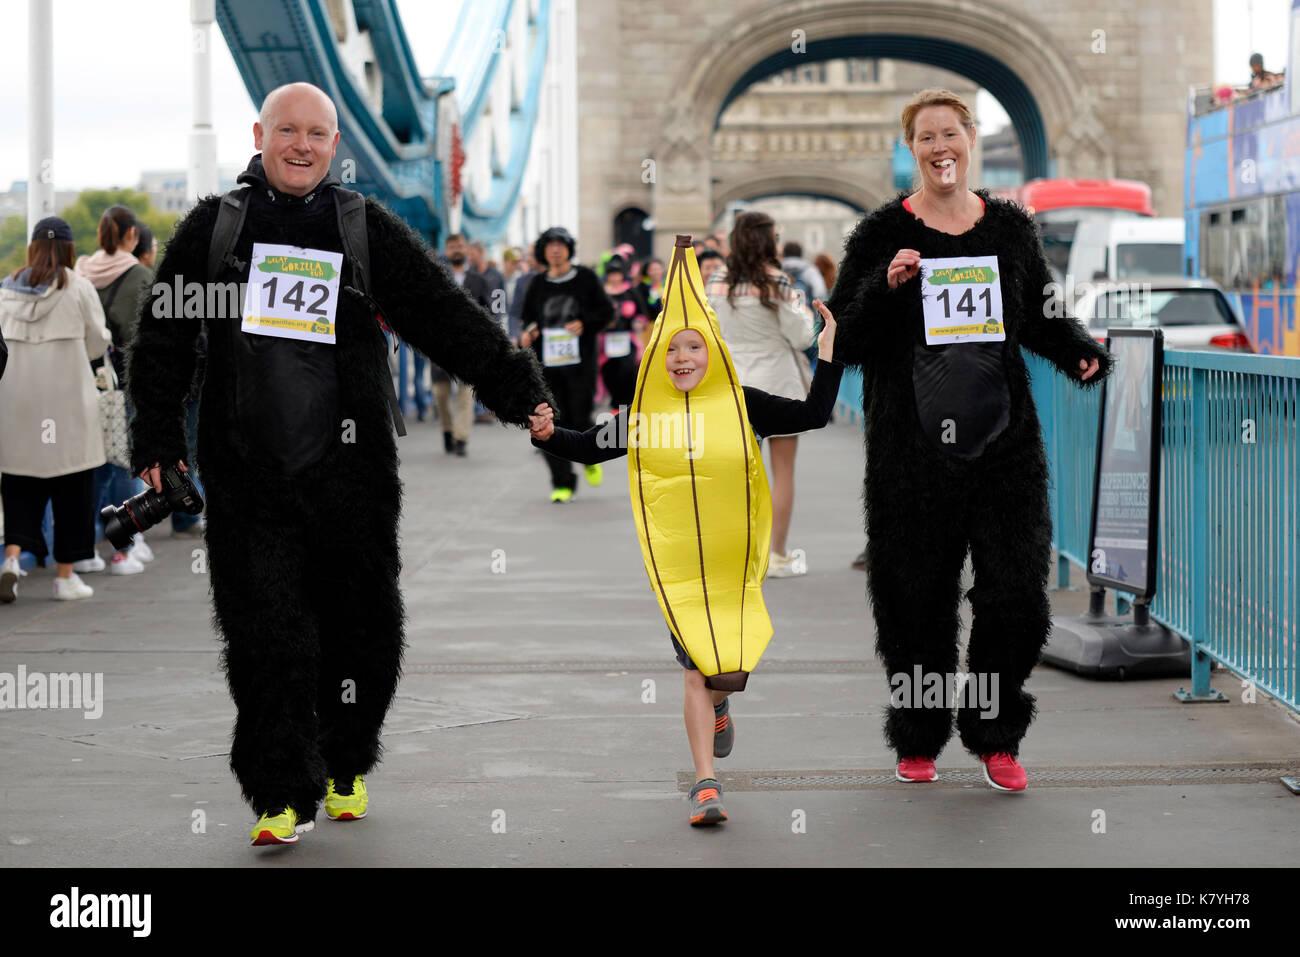 great-gorilla-run-london-family-running-across-tower-bridge-child-K7YH78.jpg